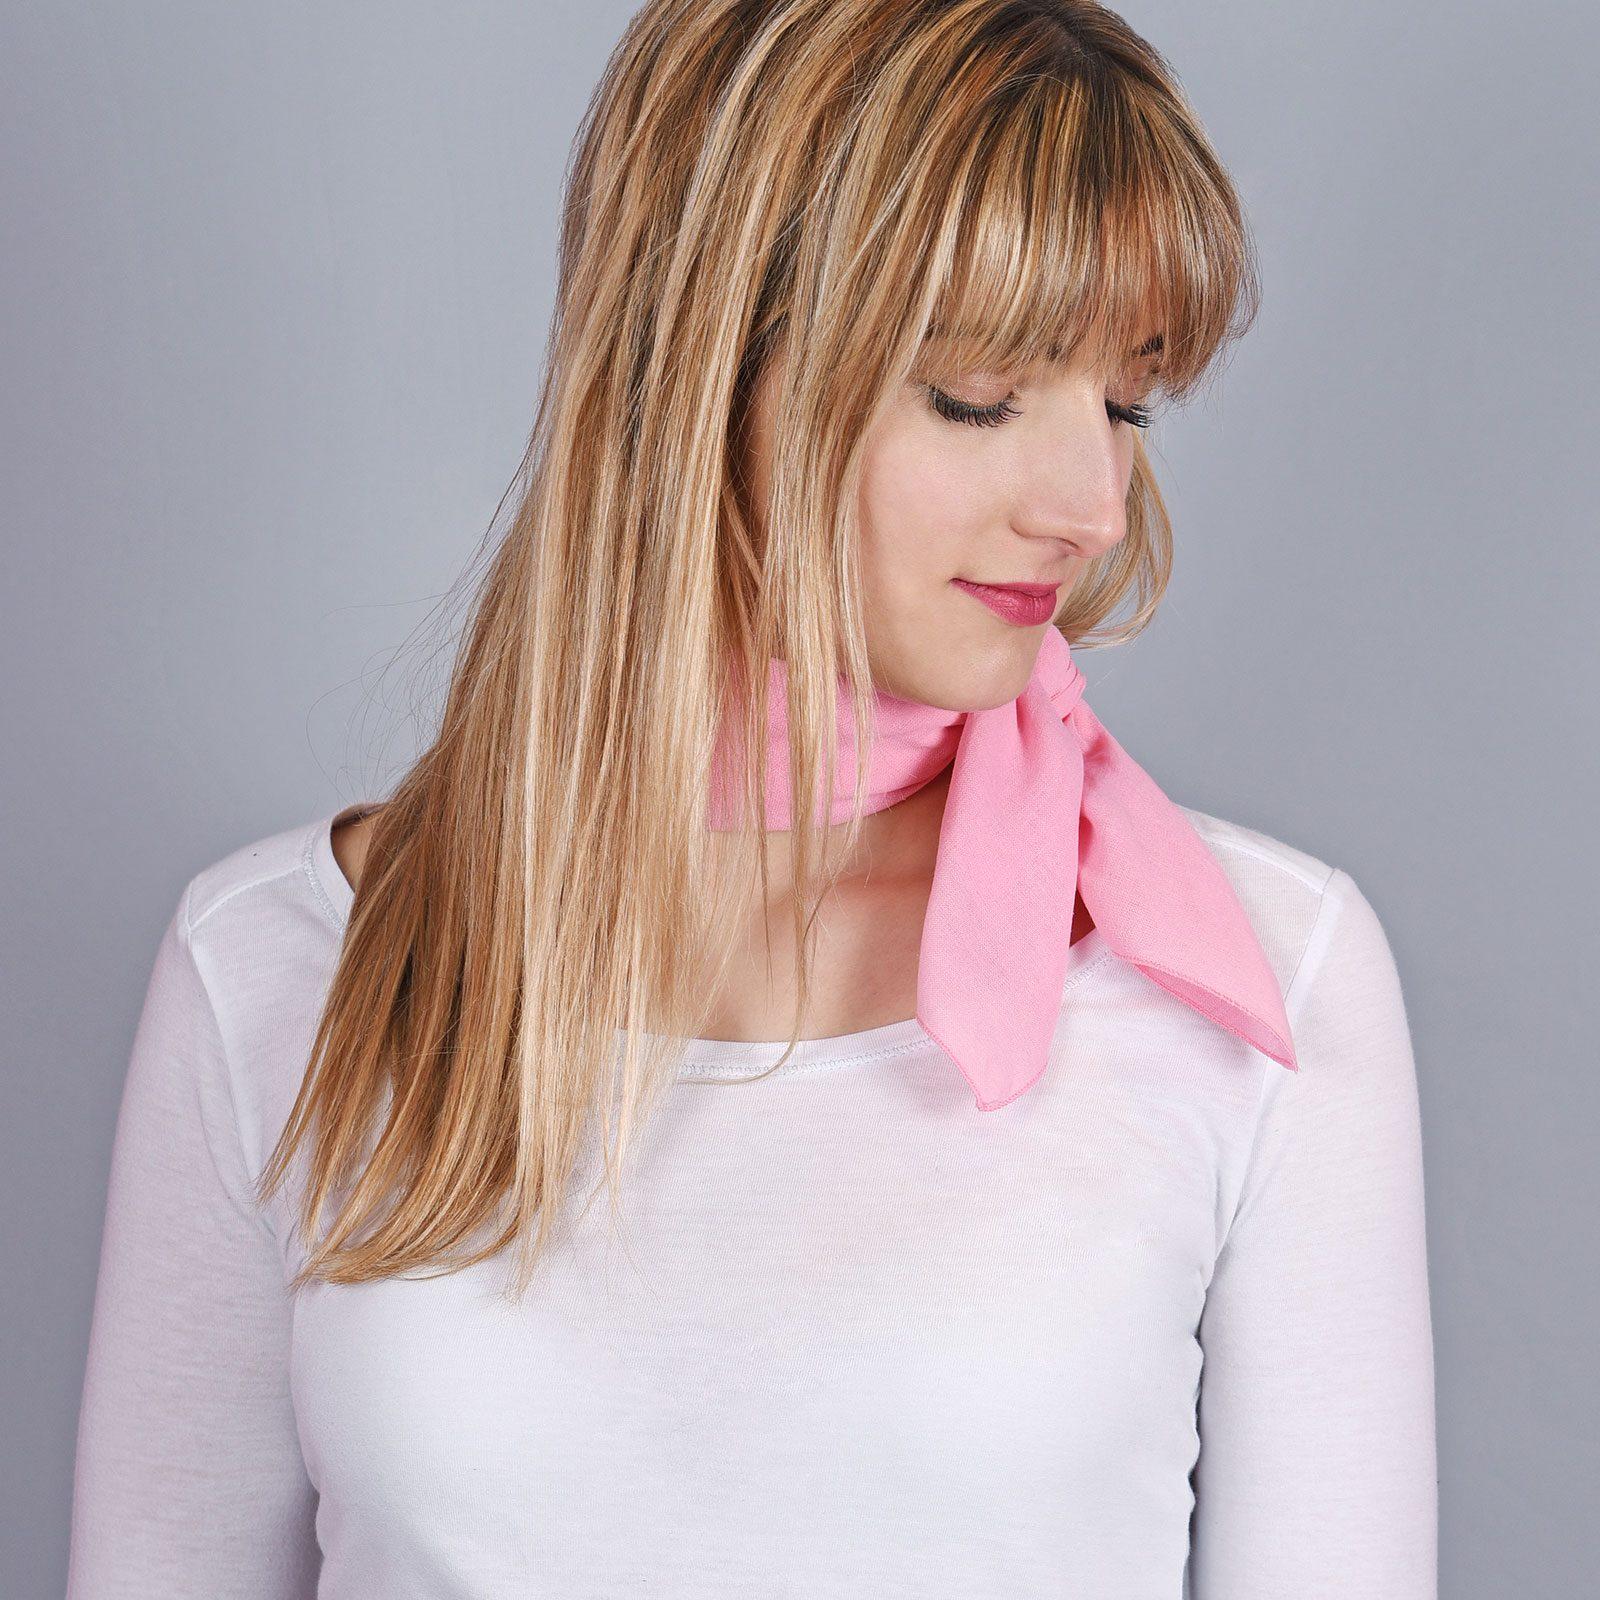 http://lookbook.allee-du-foulard.fr/wp-content/uploads/2018/06/AT-04302-VF16-1-bandana-coton-rose-1600x1600.jpg